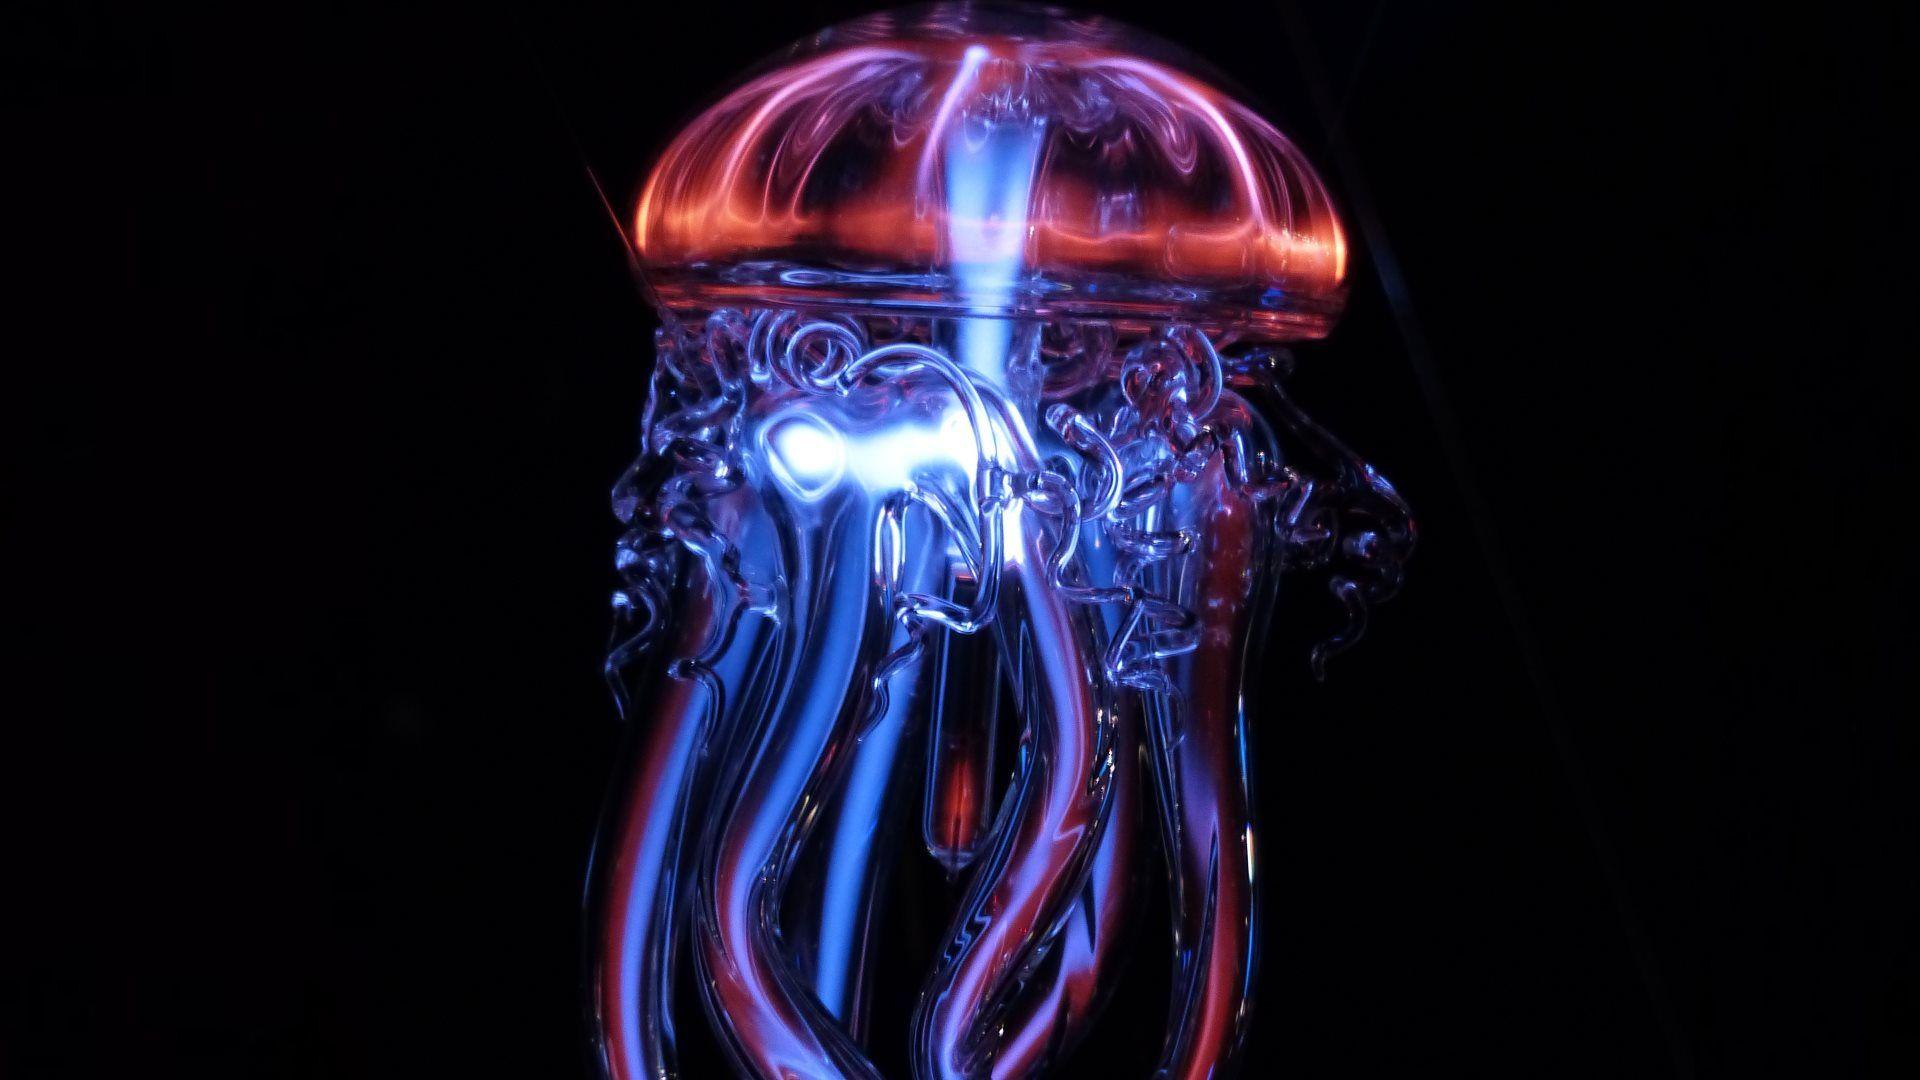 Moon jellyfish 4K Ultra HD Wallpaper High Definition HD